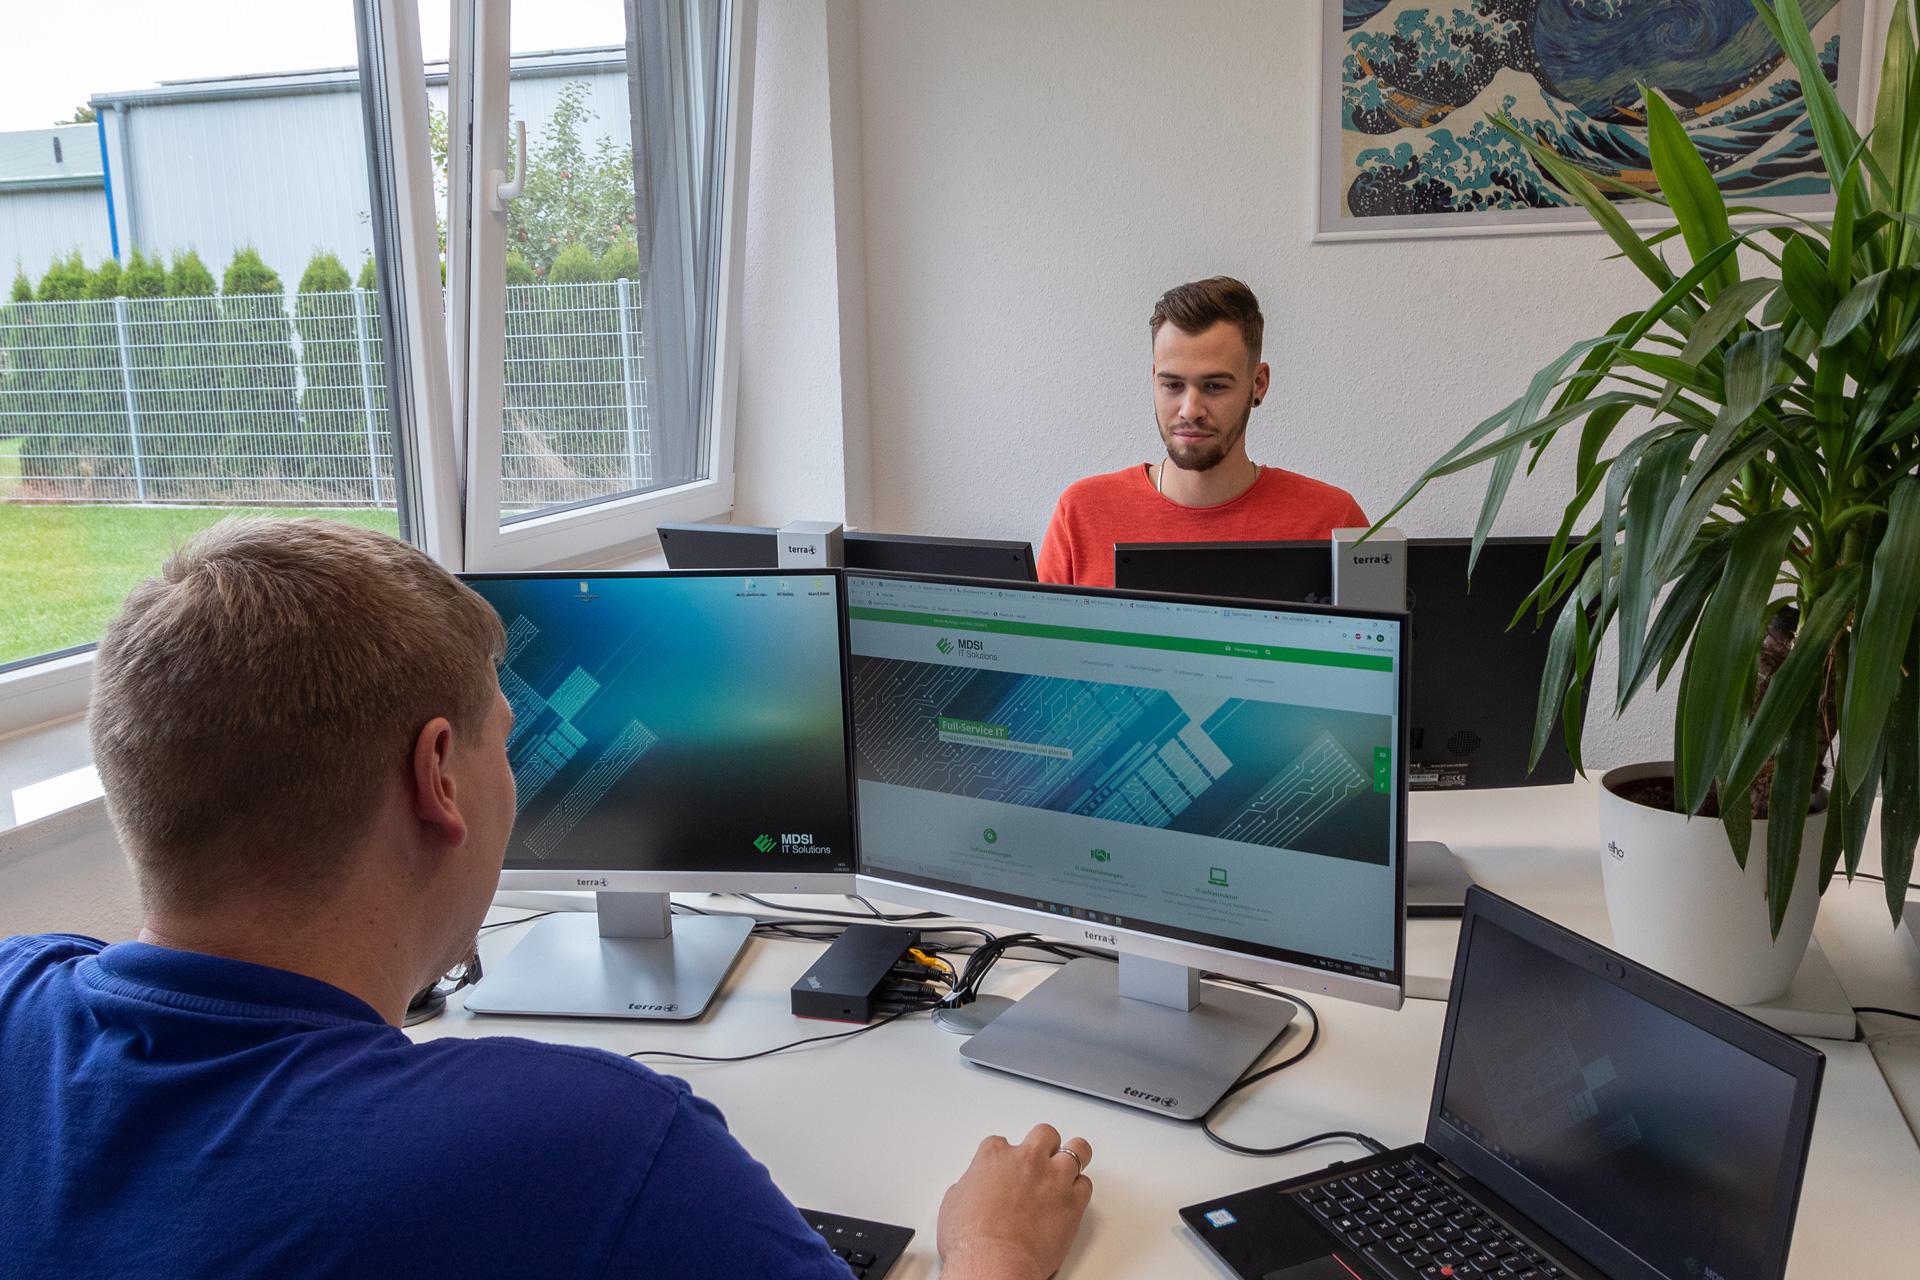 3arbeiten-bei-mdsi.jpg – MDSI IT Solutions GmbH